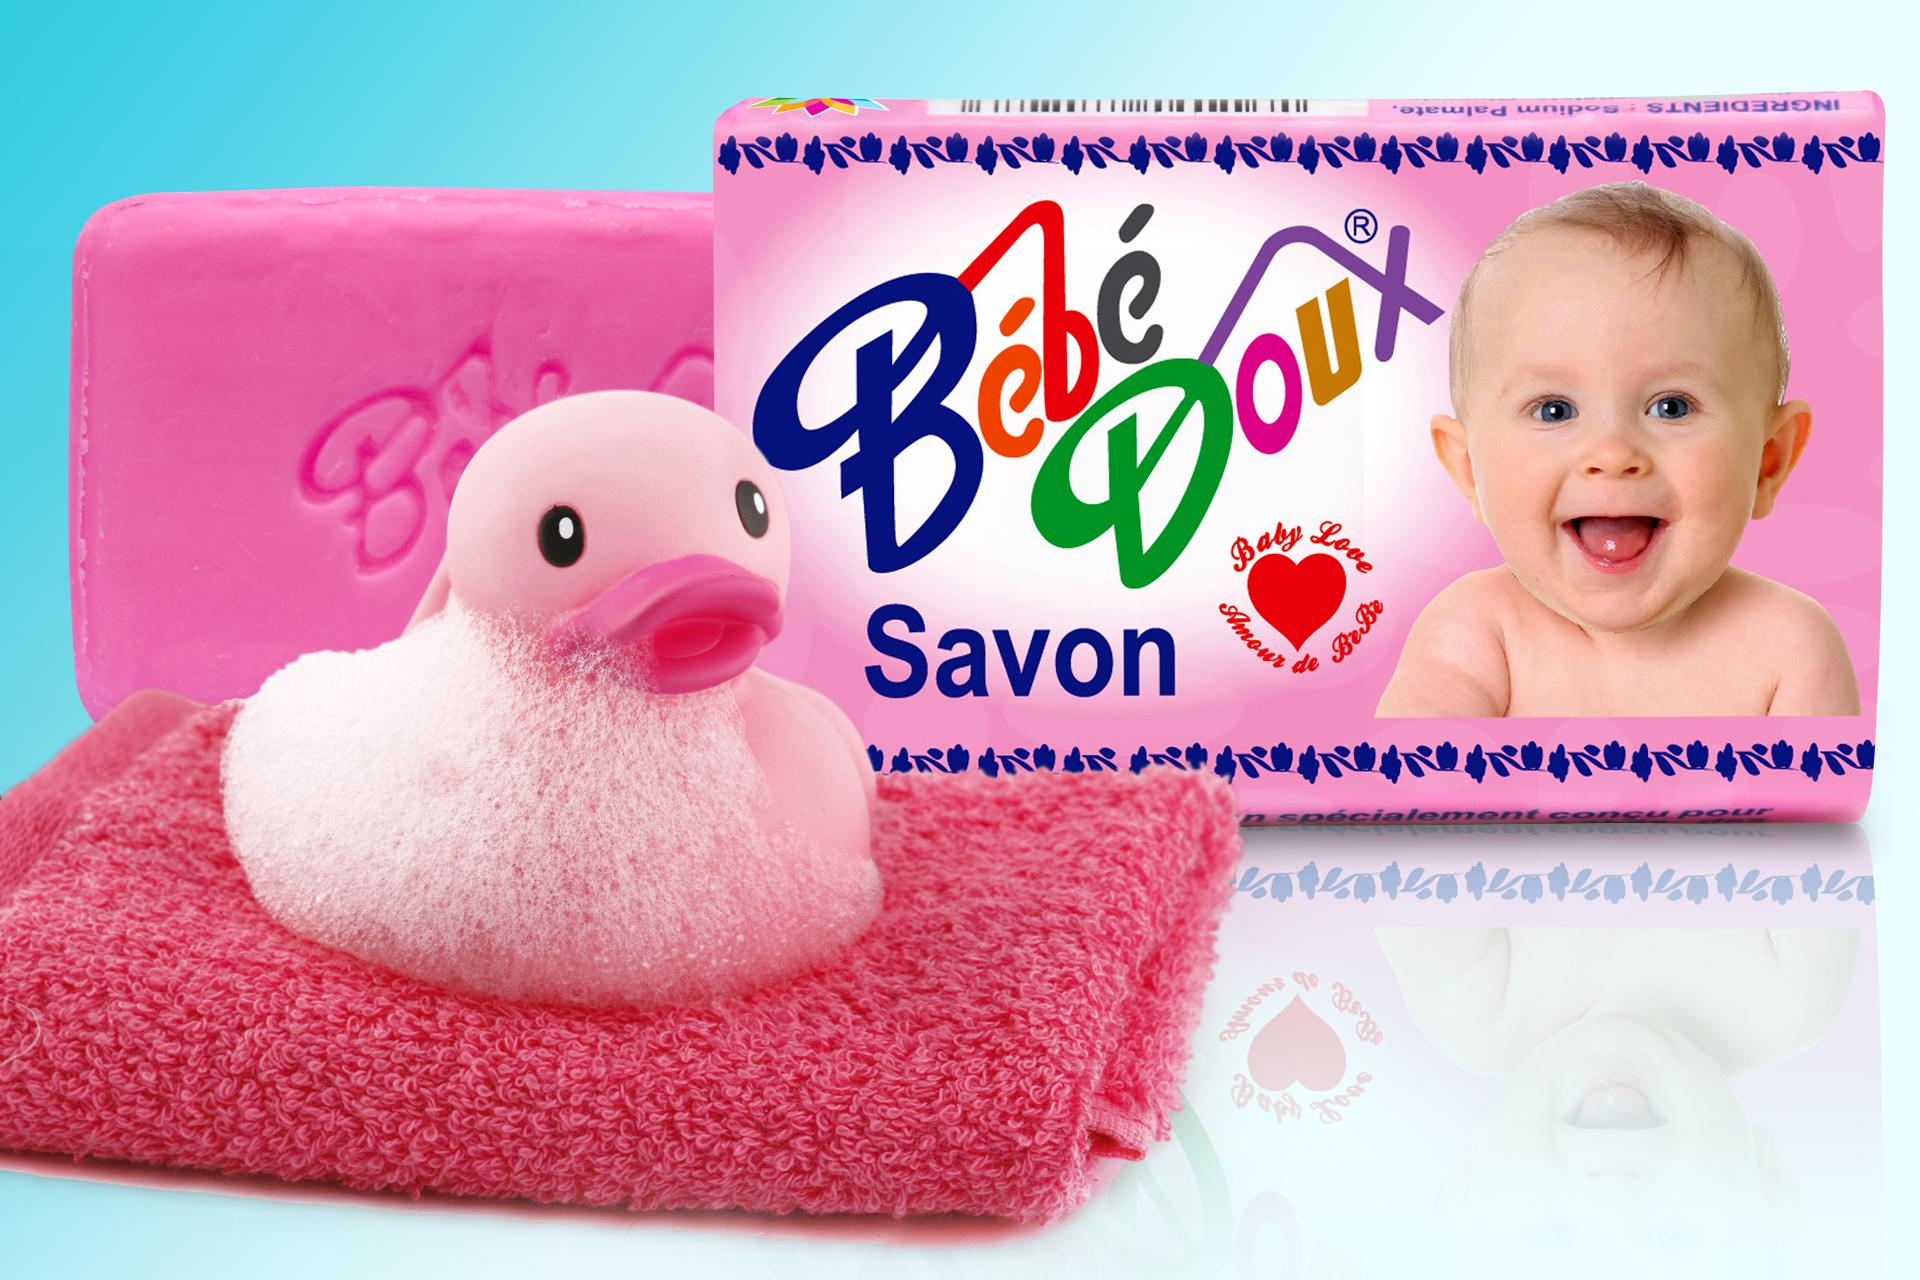 https://www.orbitsarl.com/wp-content/uploads/2017/10/Product-Baby_BabeDoux-Savon_1920x1280-FIN.jpg